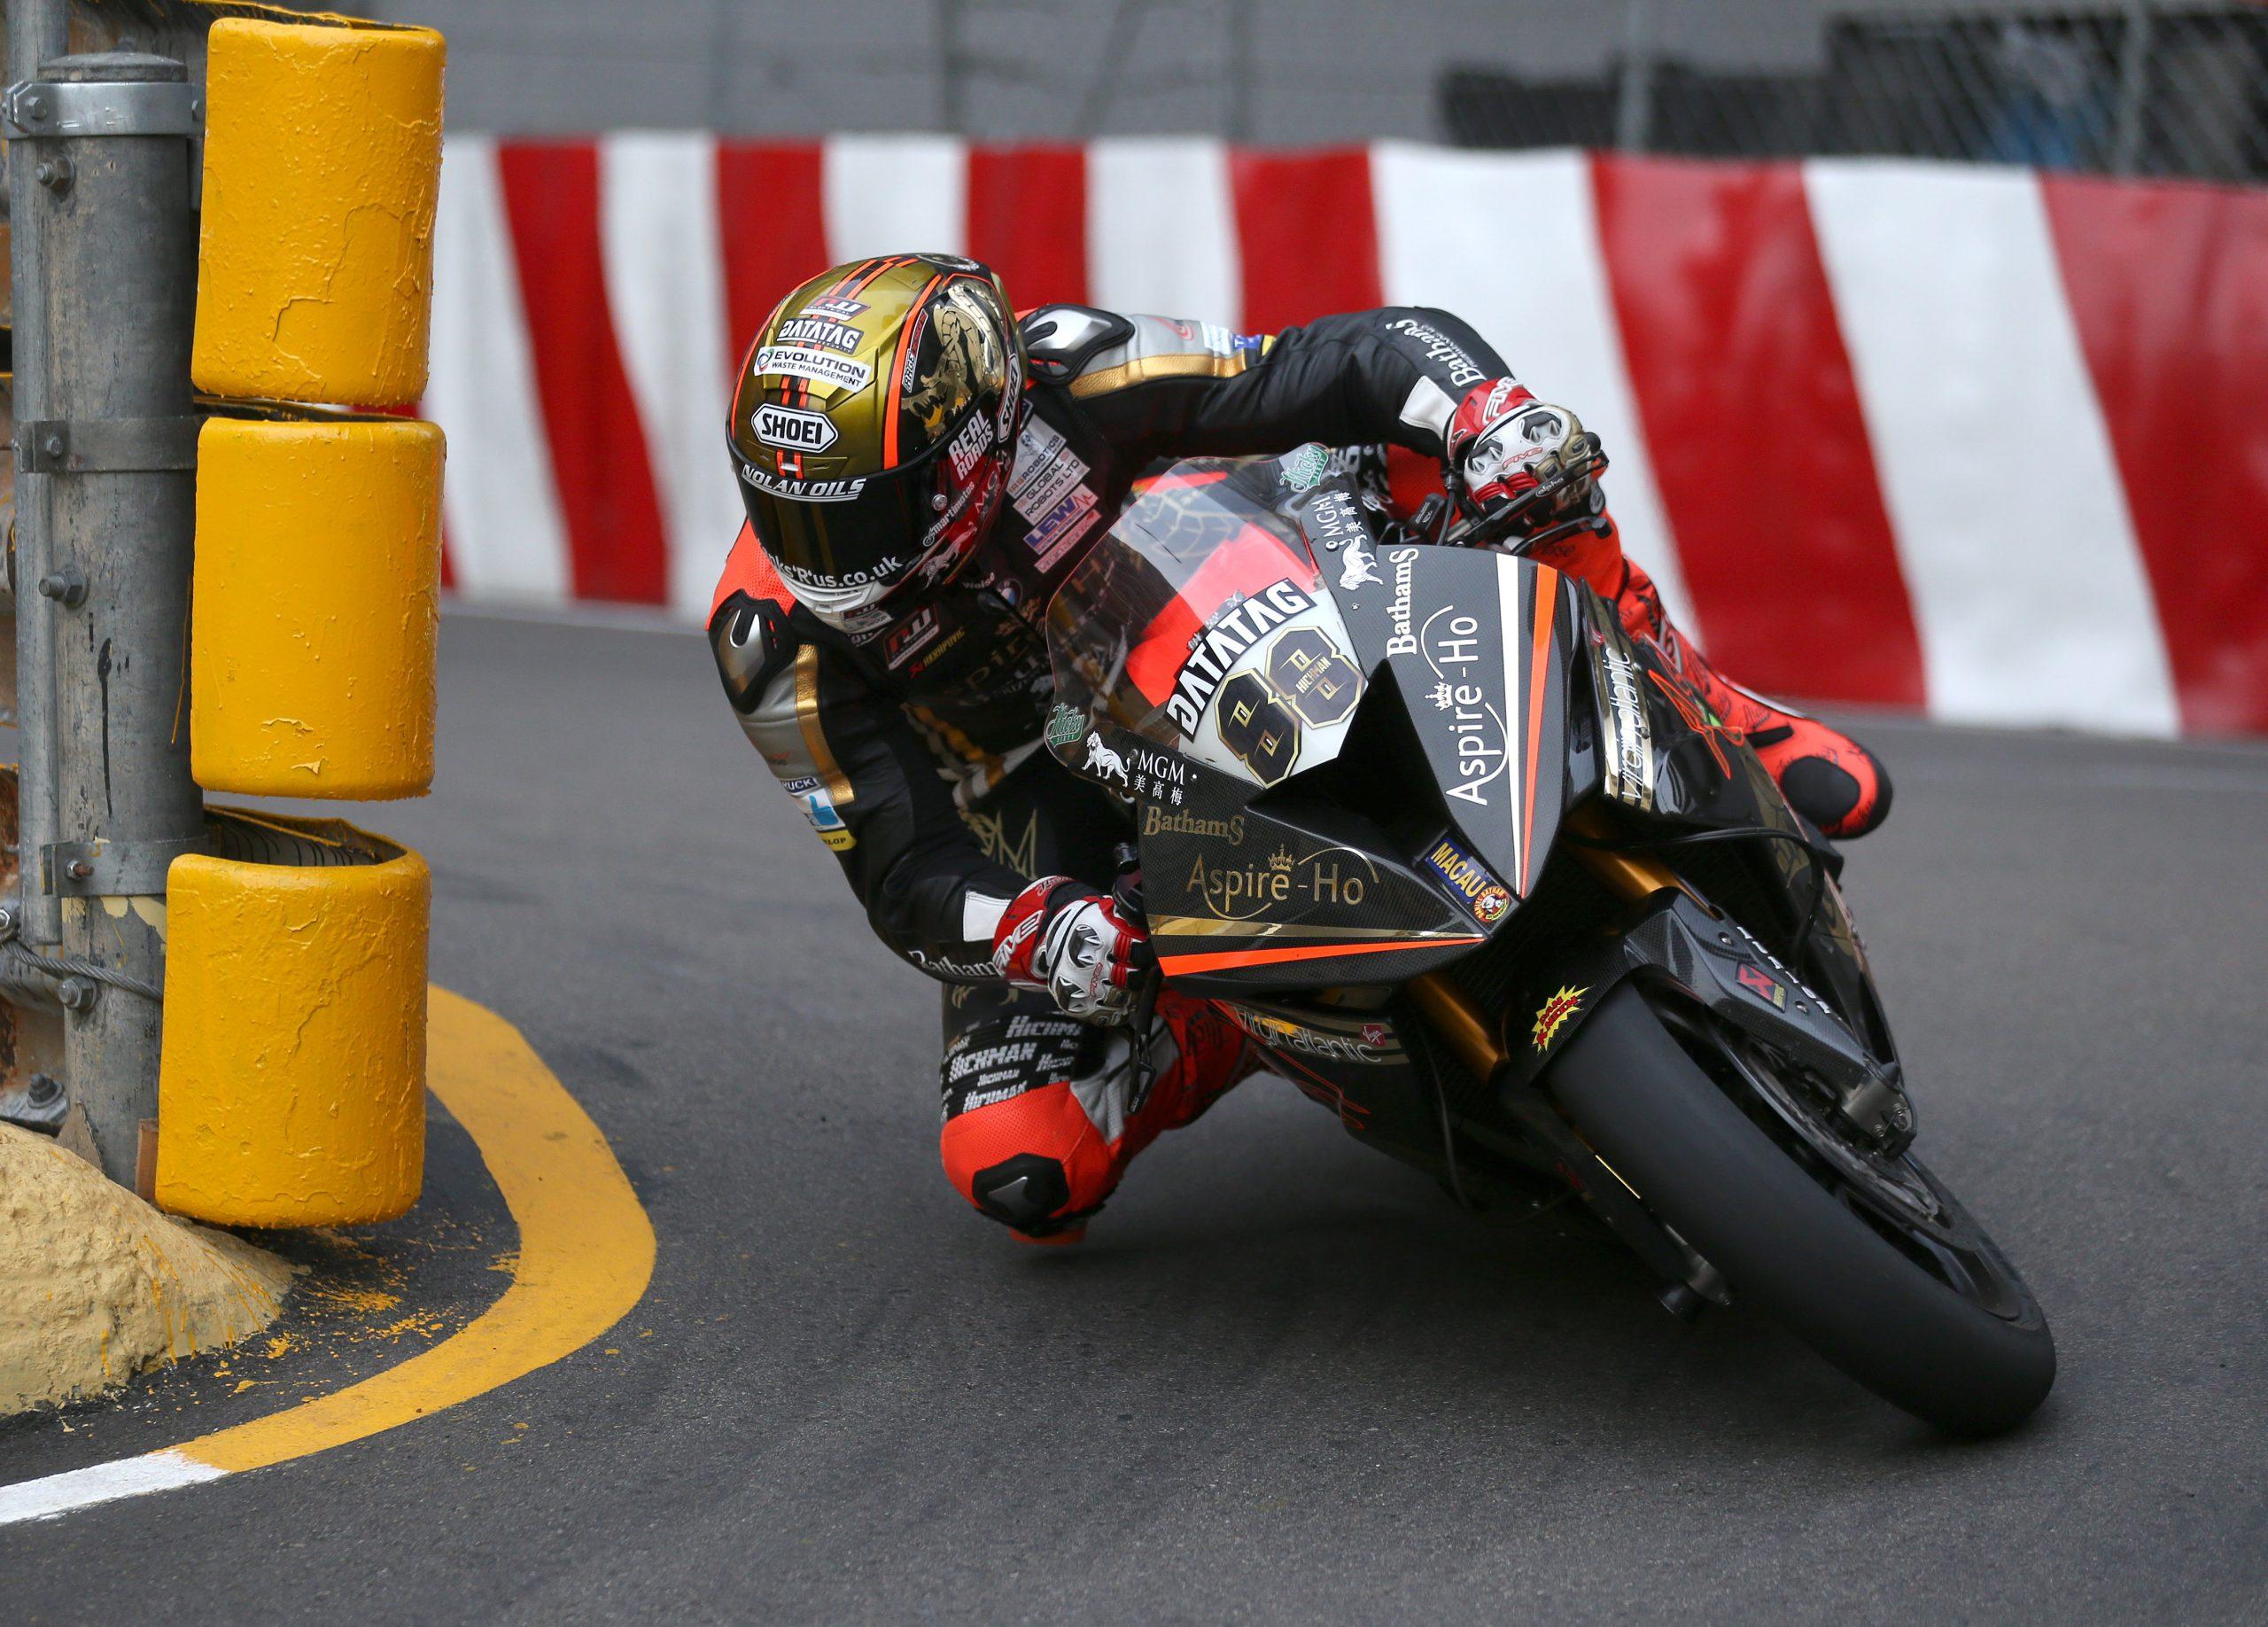 Peter Hickman in action at 2018 Macau GP